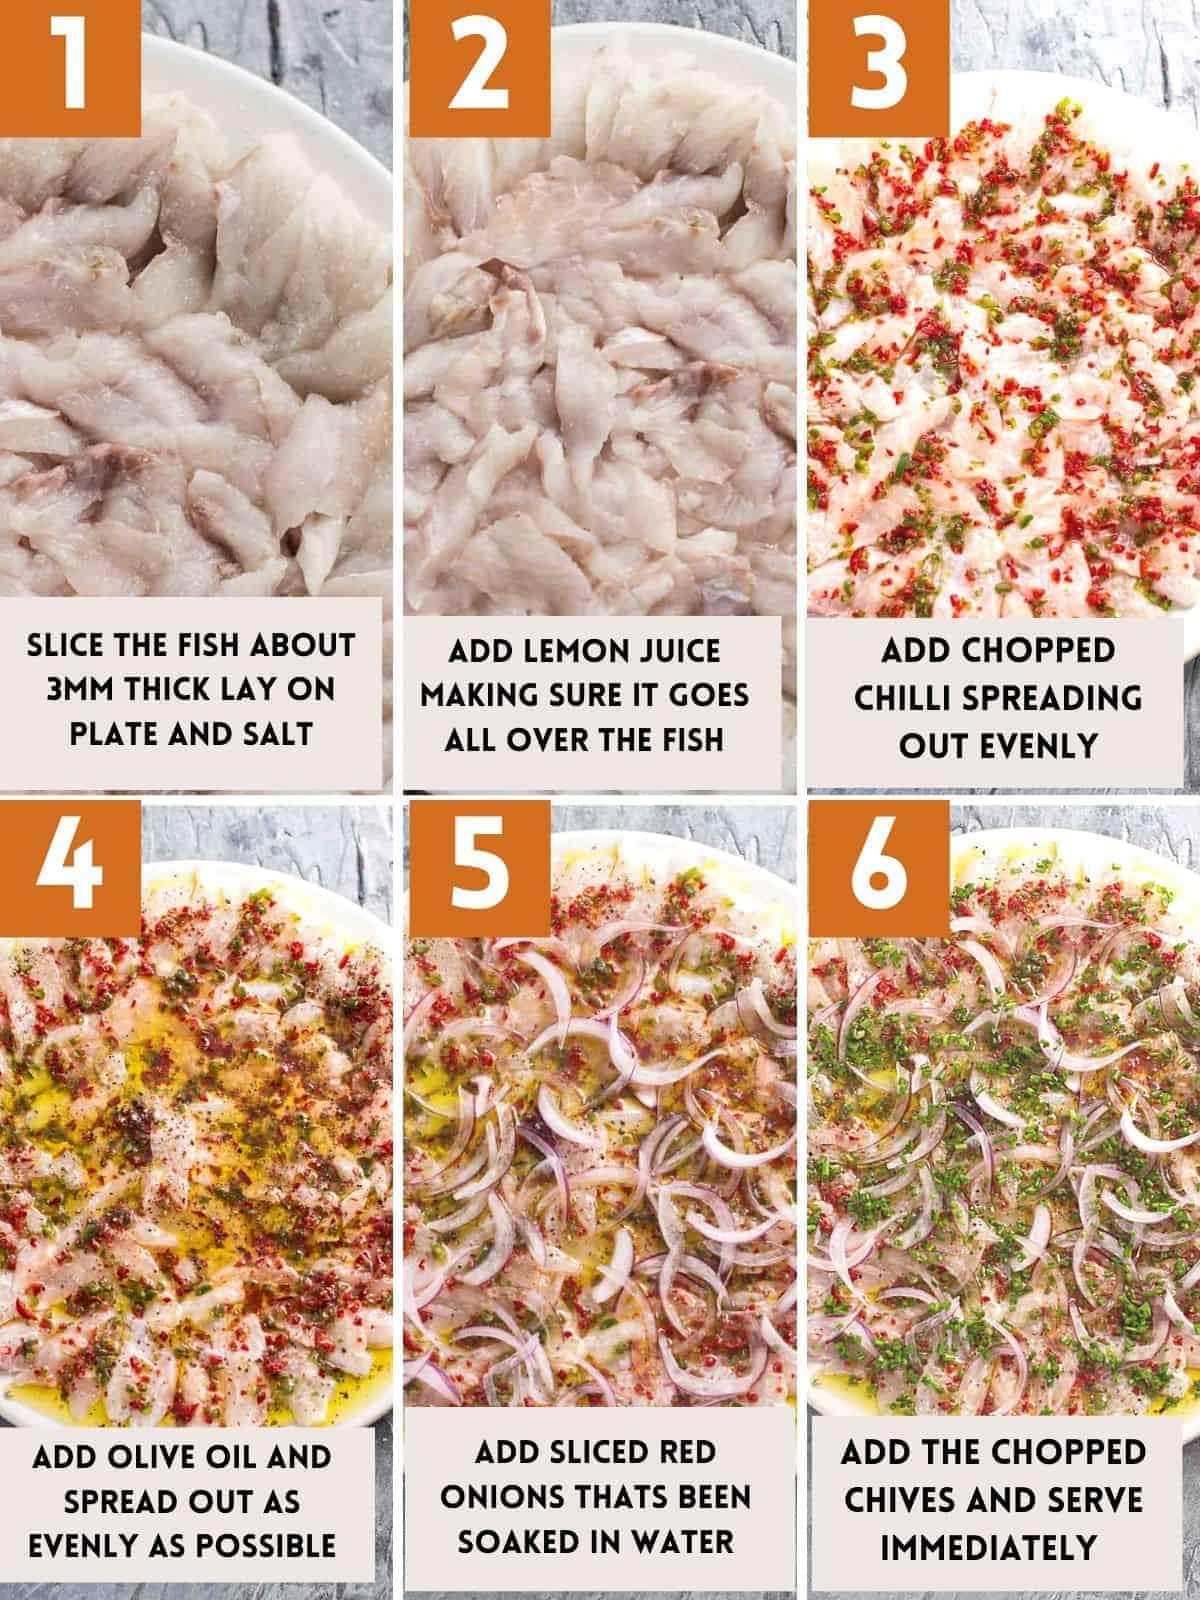 how to make sea bass crudo step by step